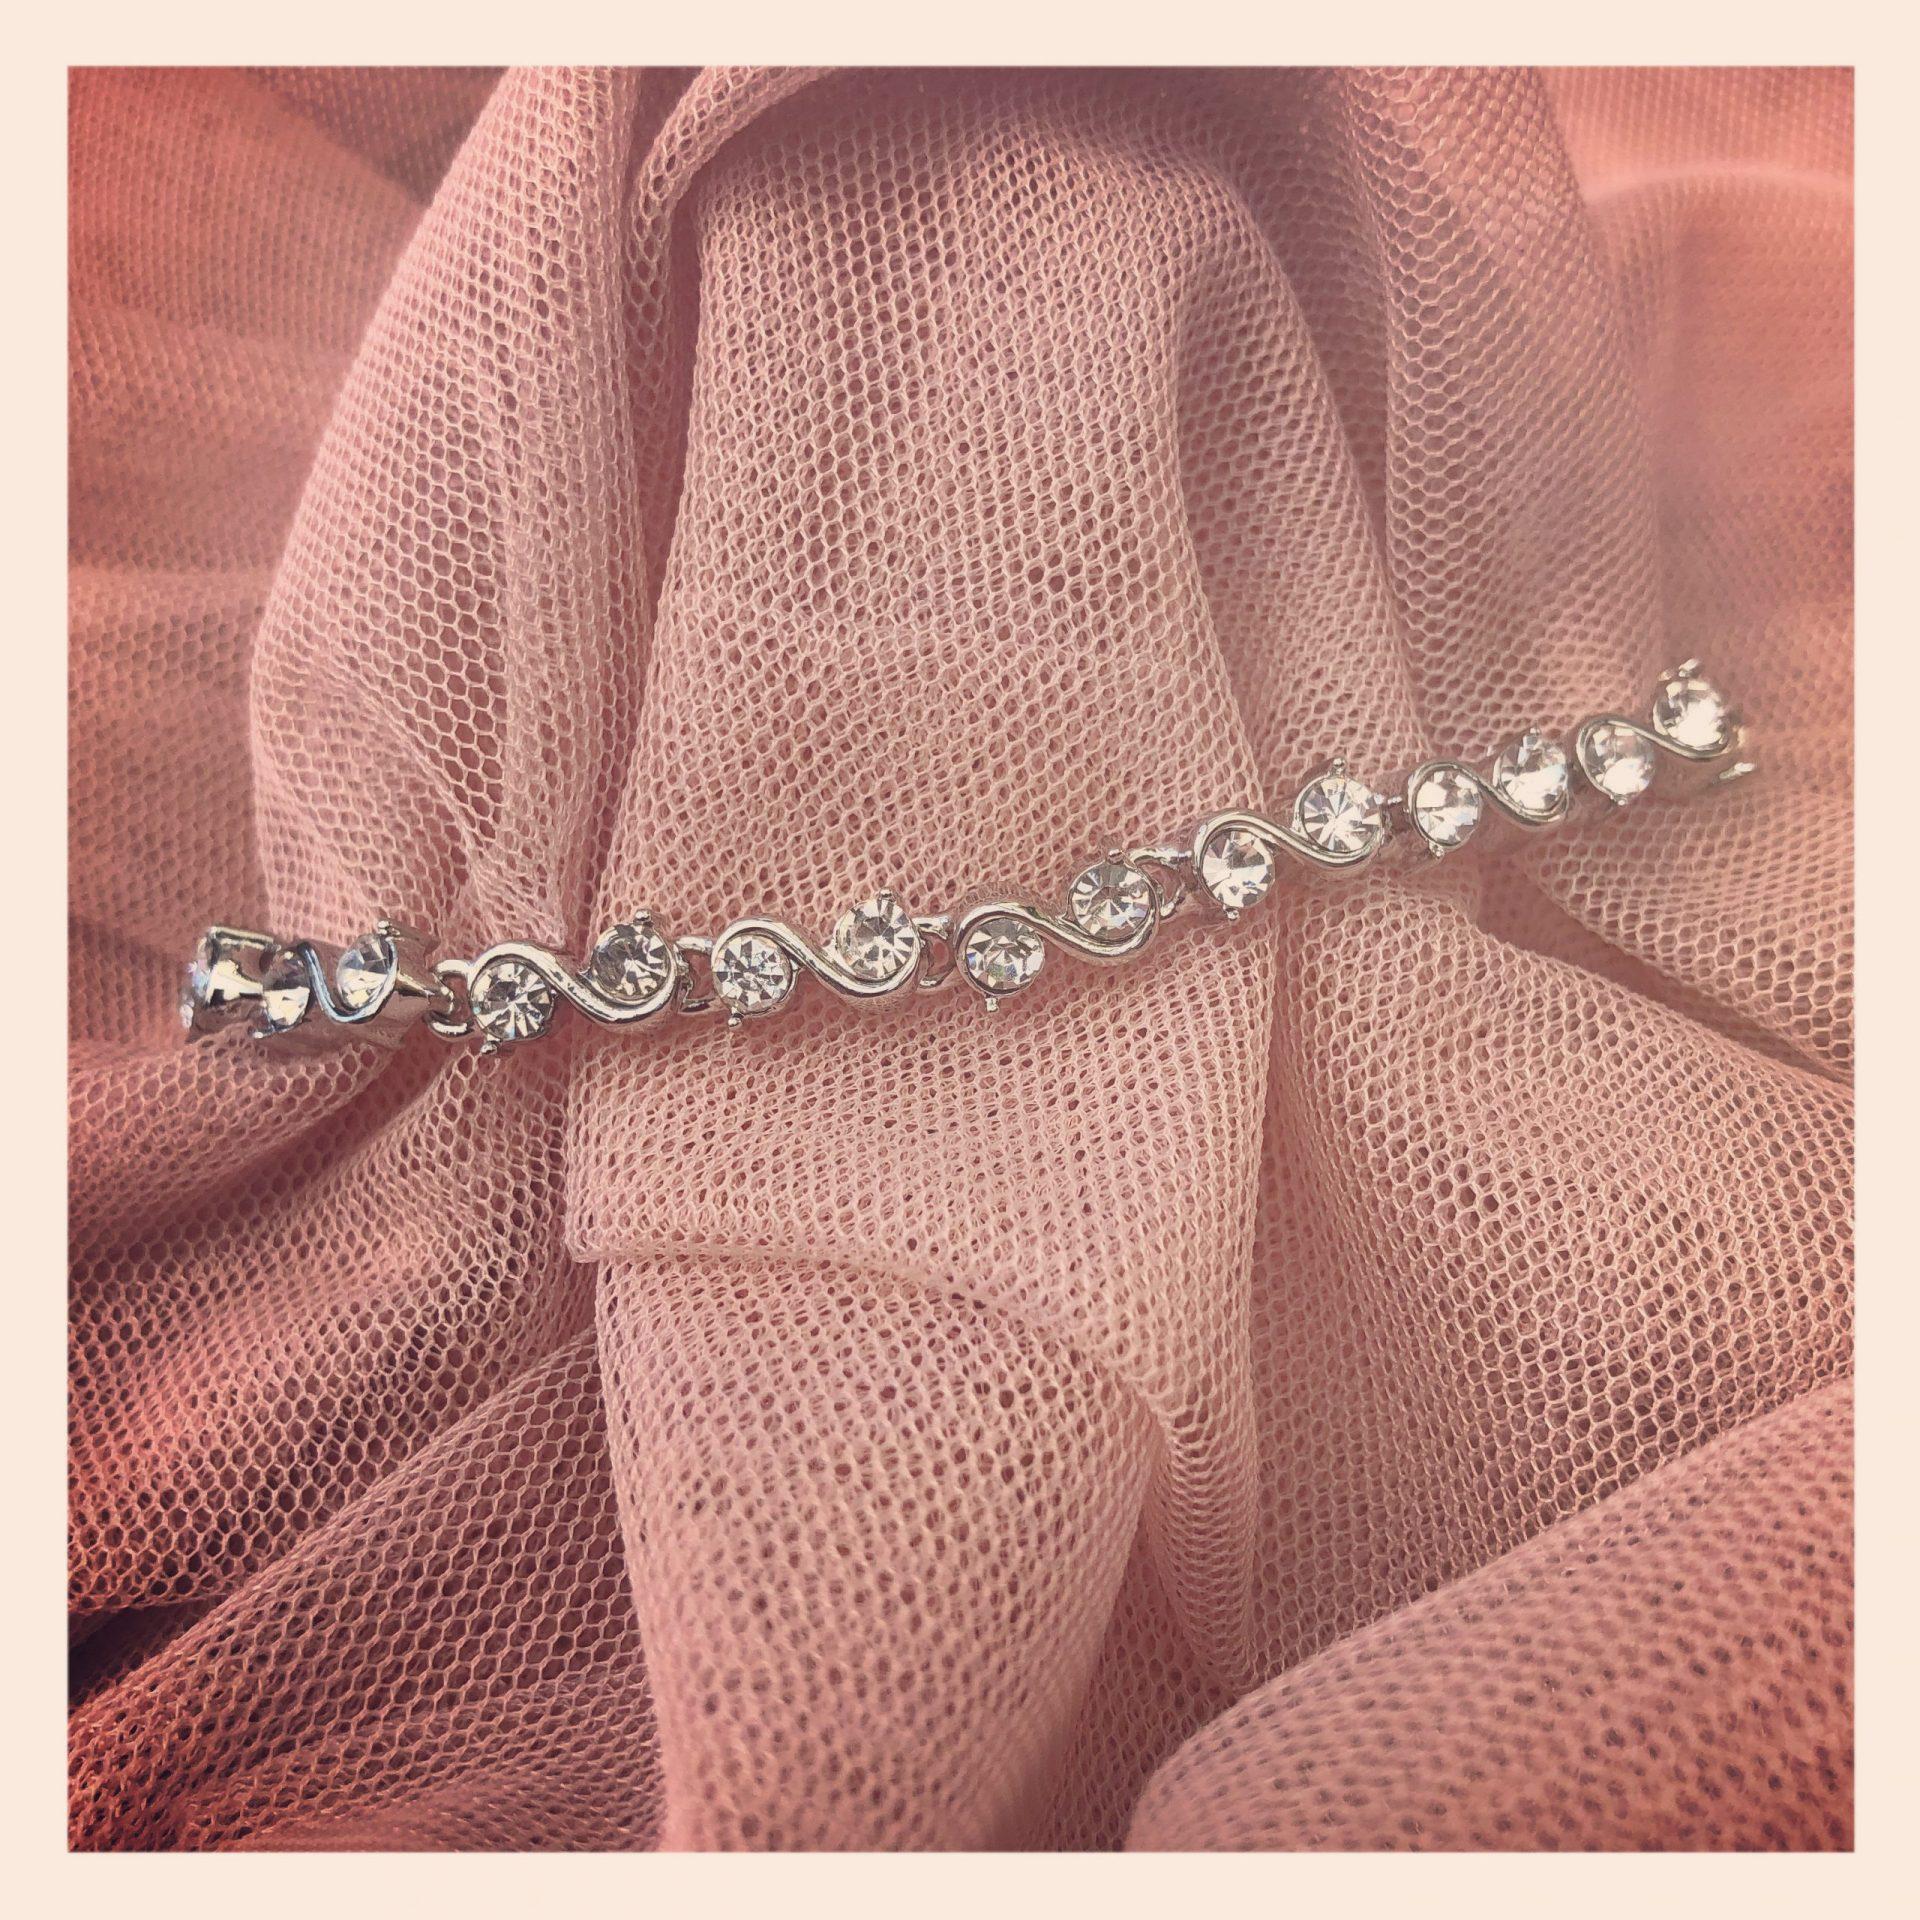 6. Truly Romantic – Bracelet